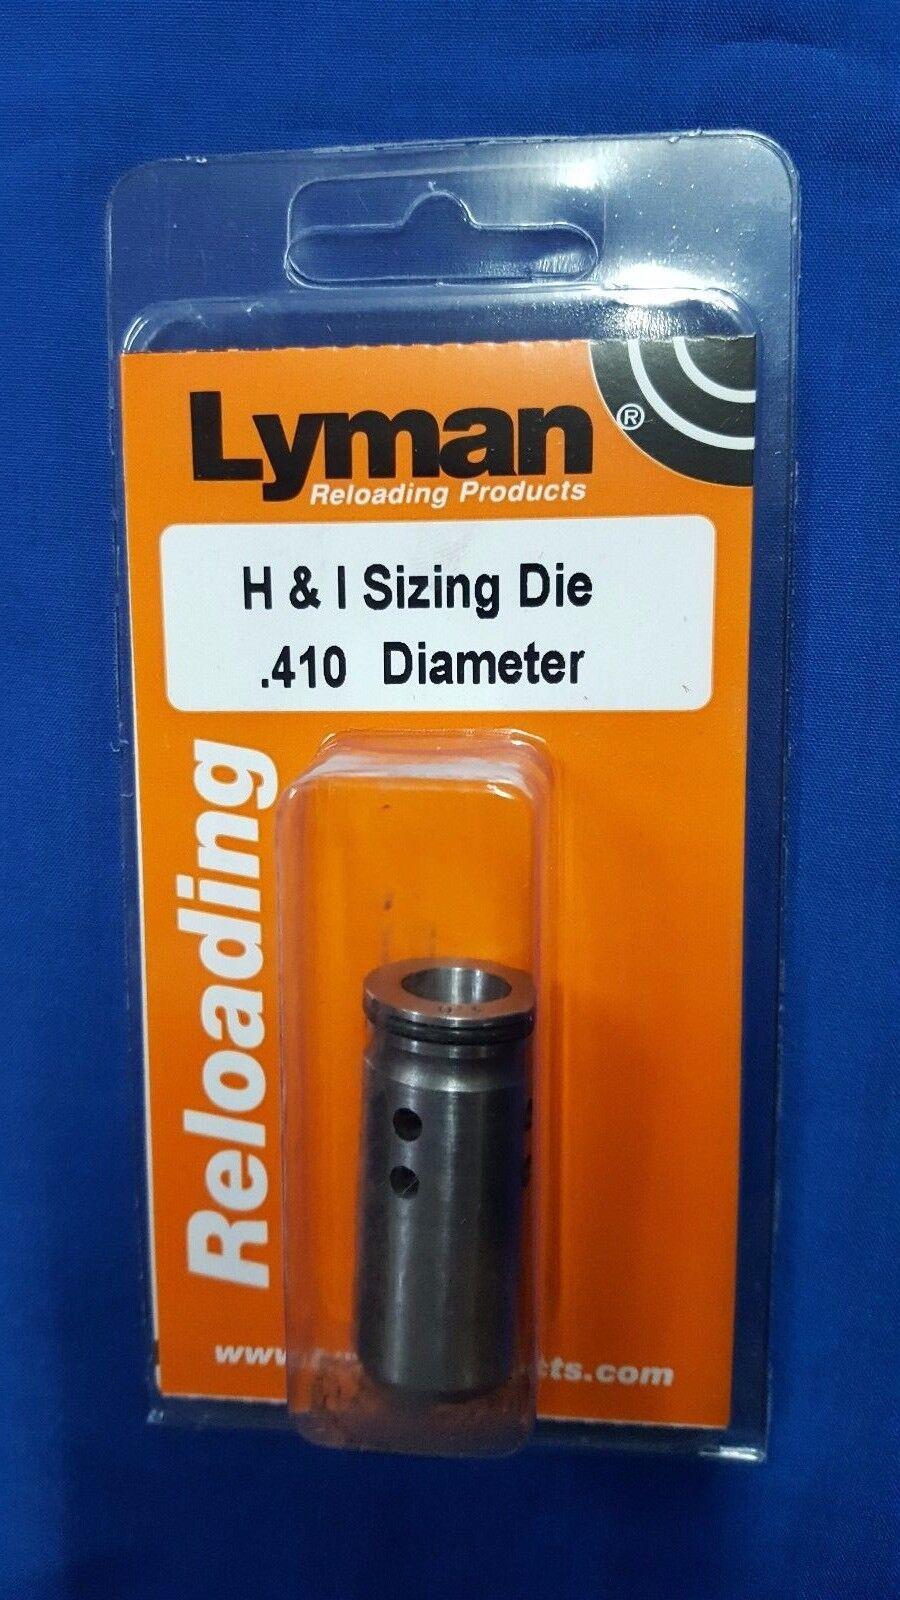 Lyman H & I Sizing   Sizer Die .410 - NEW 2766505 410